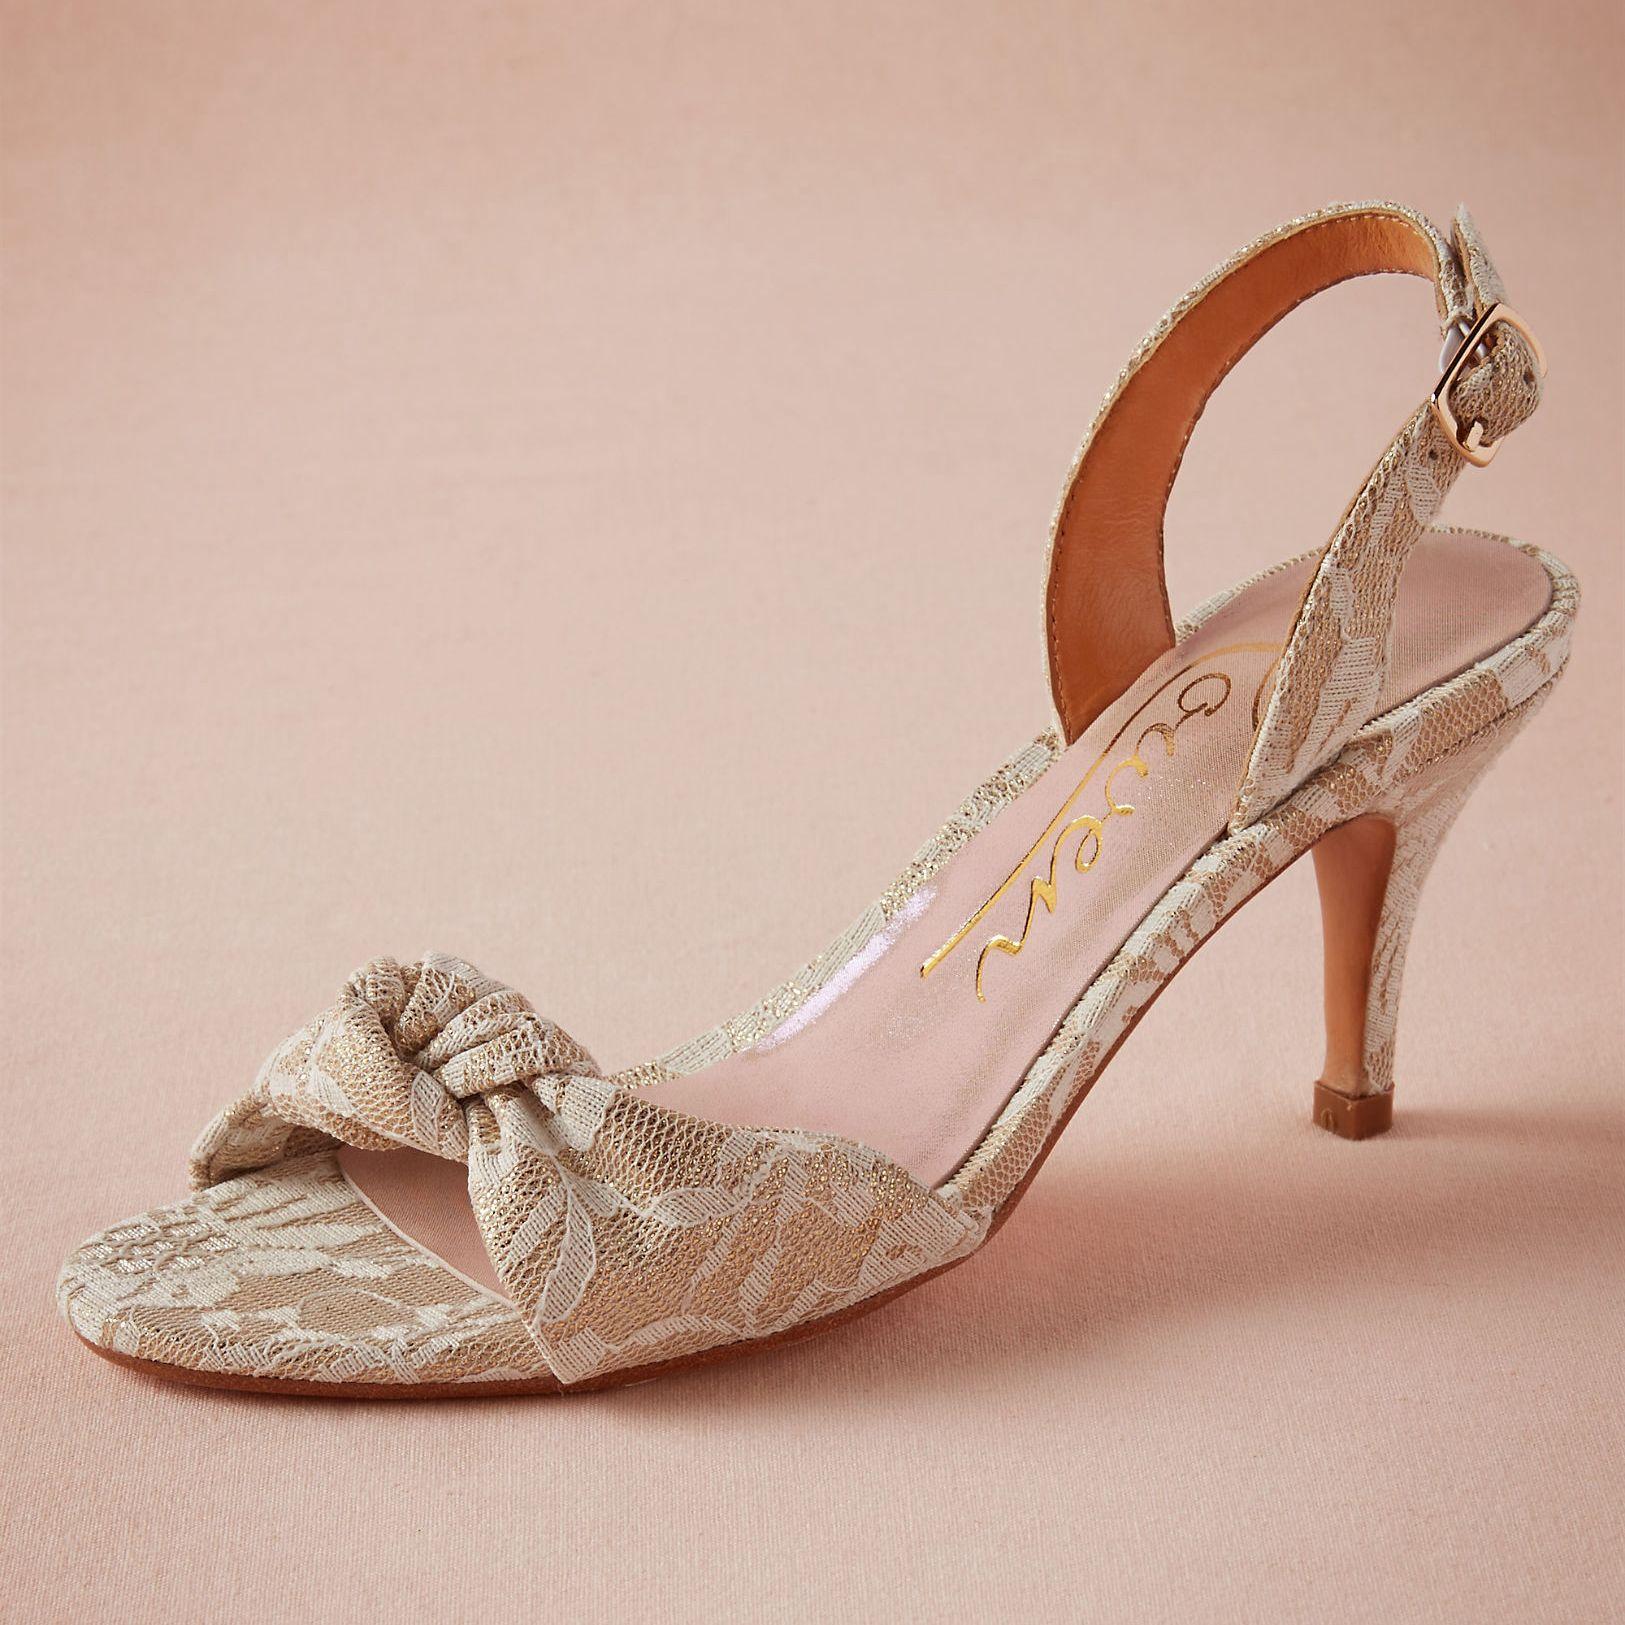 open toe kitten heels kitten heel wedding shoes Handmade Lace Wedding Shoes Open Toe Sandals Specter Heels Party